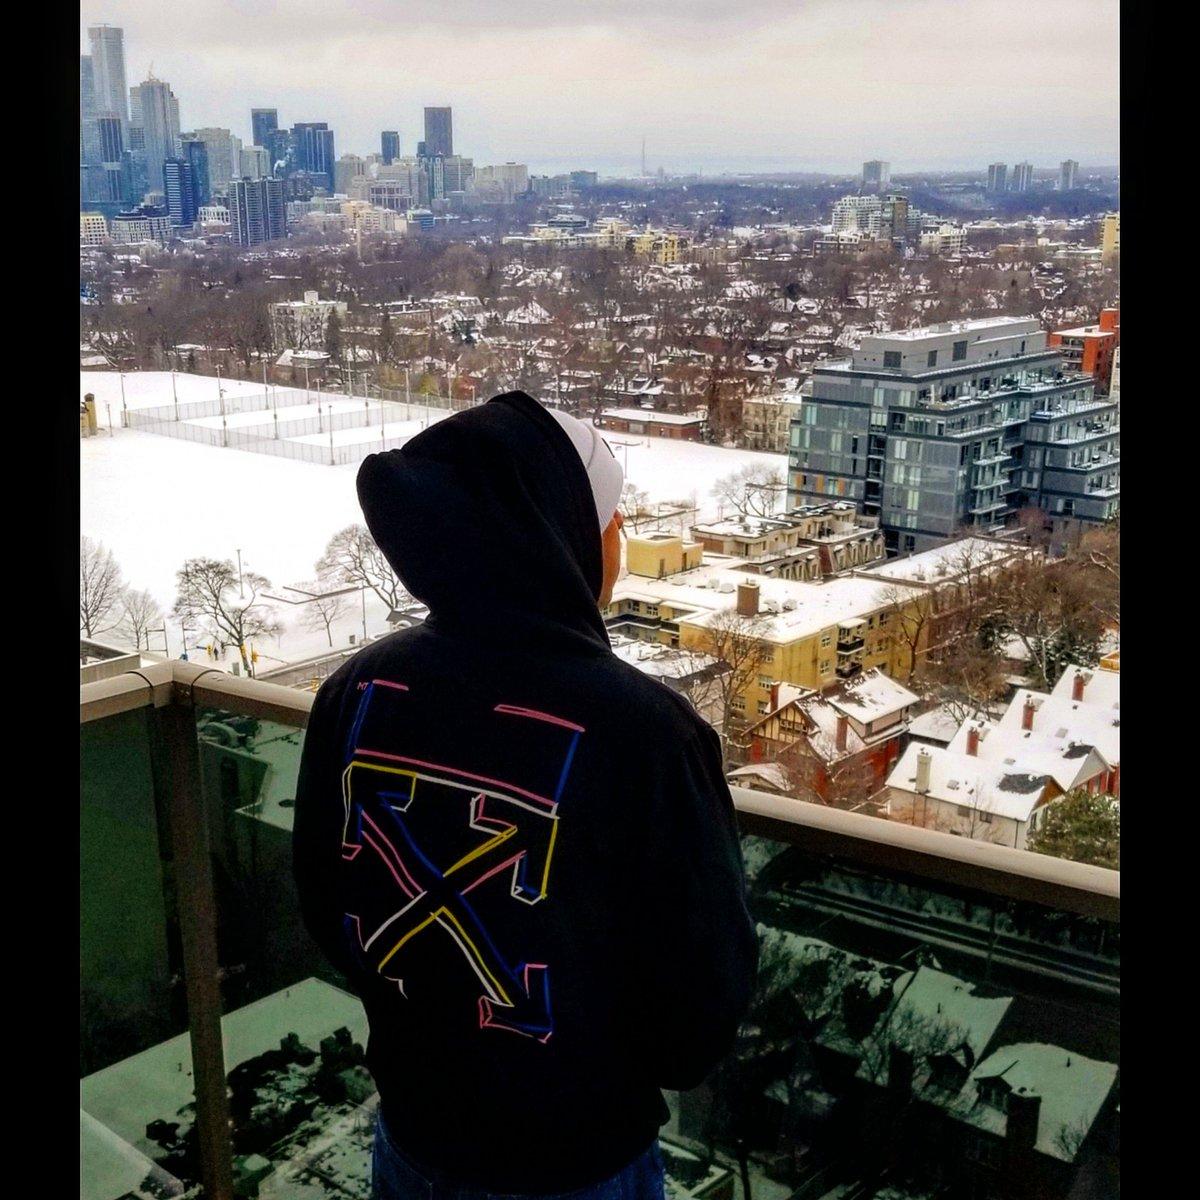 #kaipz #kaipzkillinbeats #kuyakaipz #itshiclassyo #pilauguavas #kingkaipz #edmdj #edmproducer #djproducer #musiccreators #fashionkilla #fashionmista #offwhite #virgilabloh #luxurystreetwear #streetluxury #the6ix #10thisland #viewsfromthe6 #fuckingcold #coldafpic.twitter.com/Su6r6xkMBQ